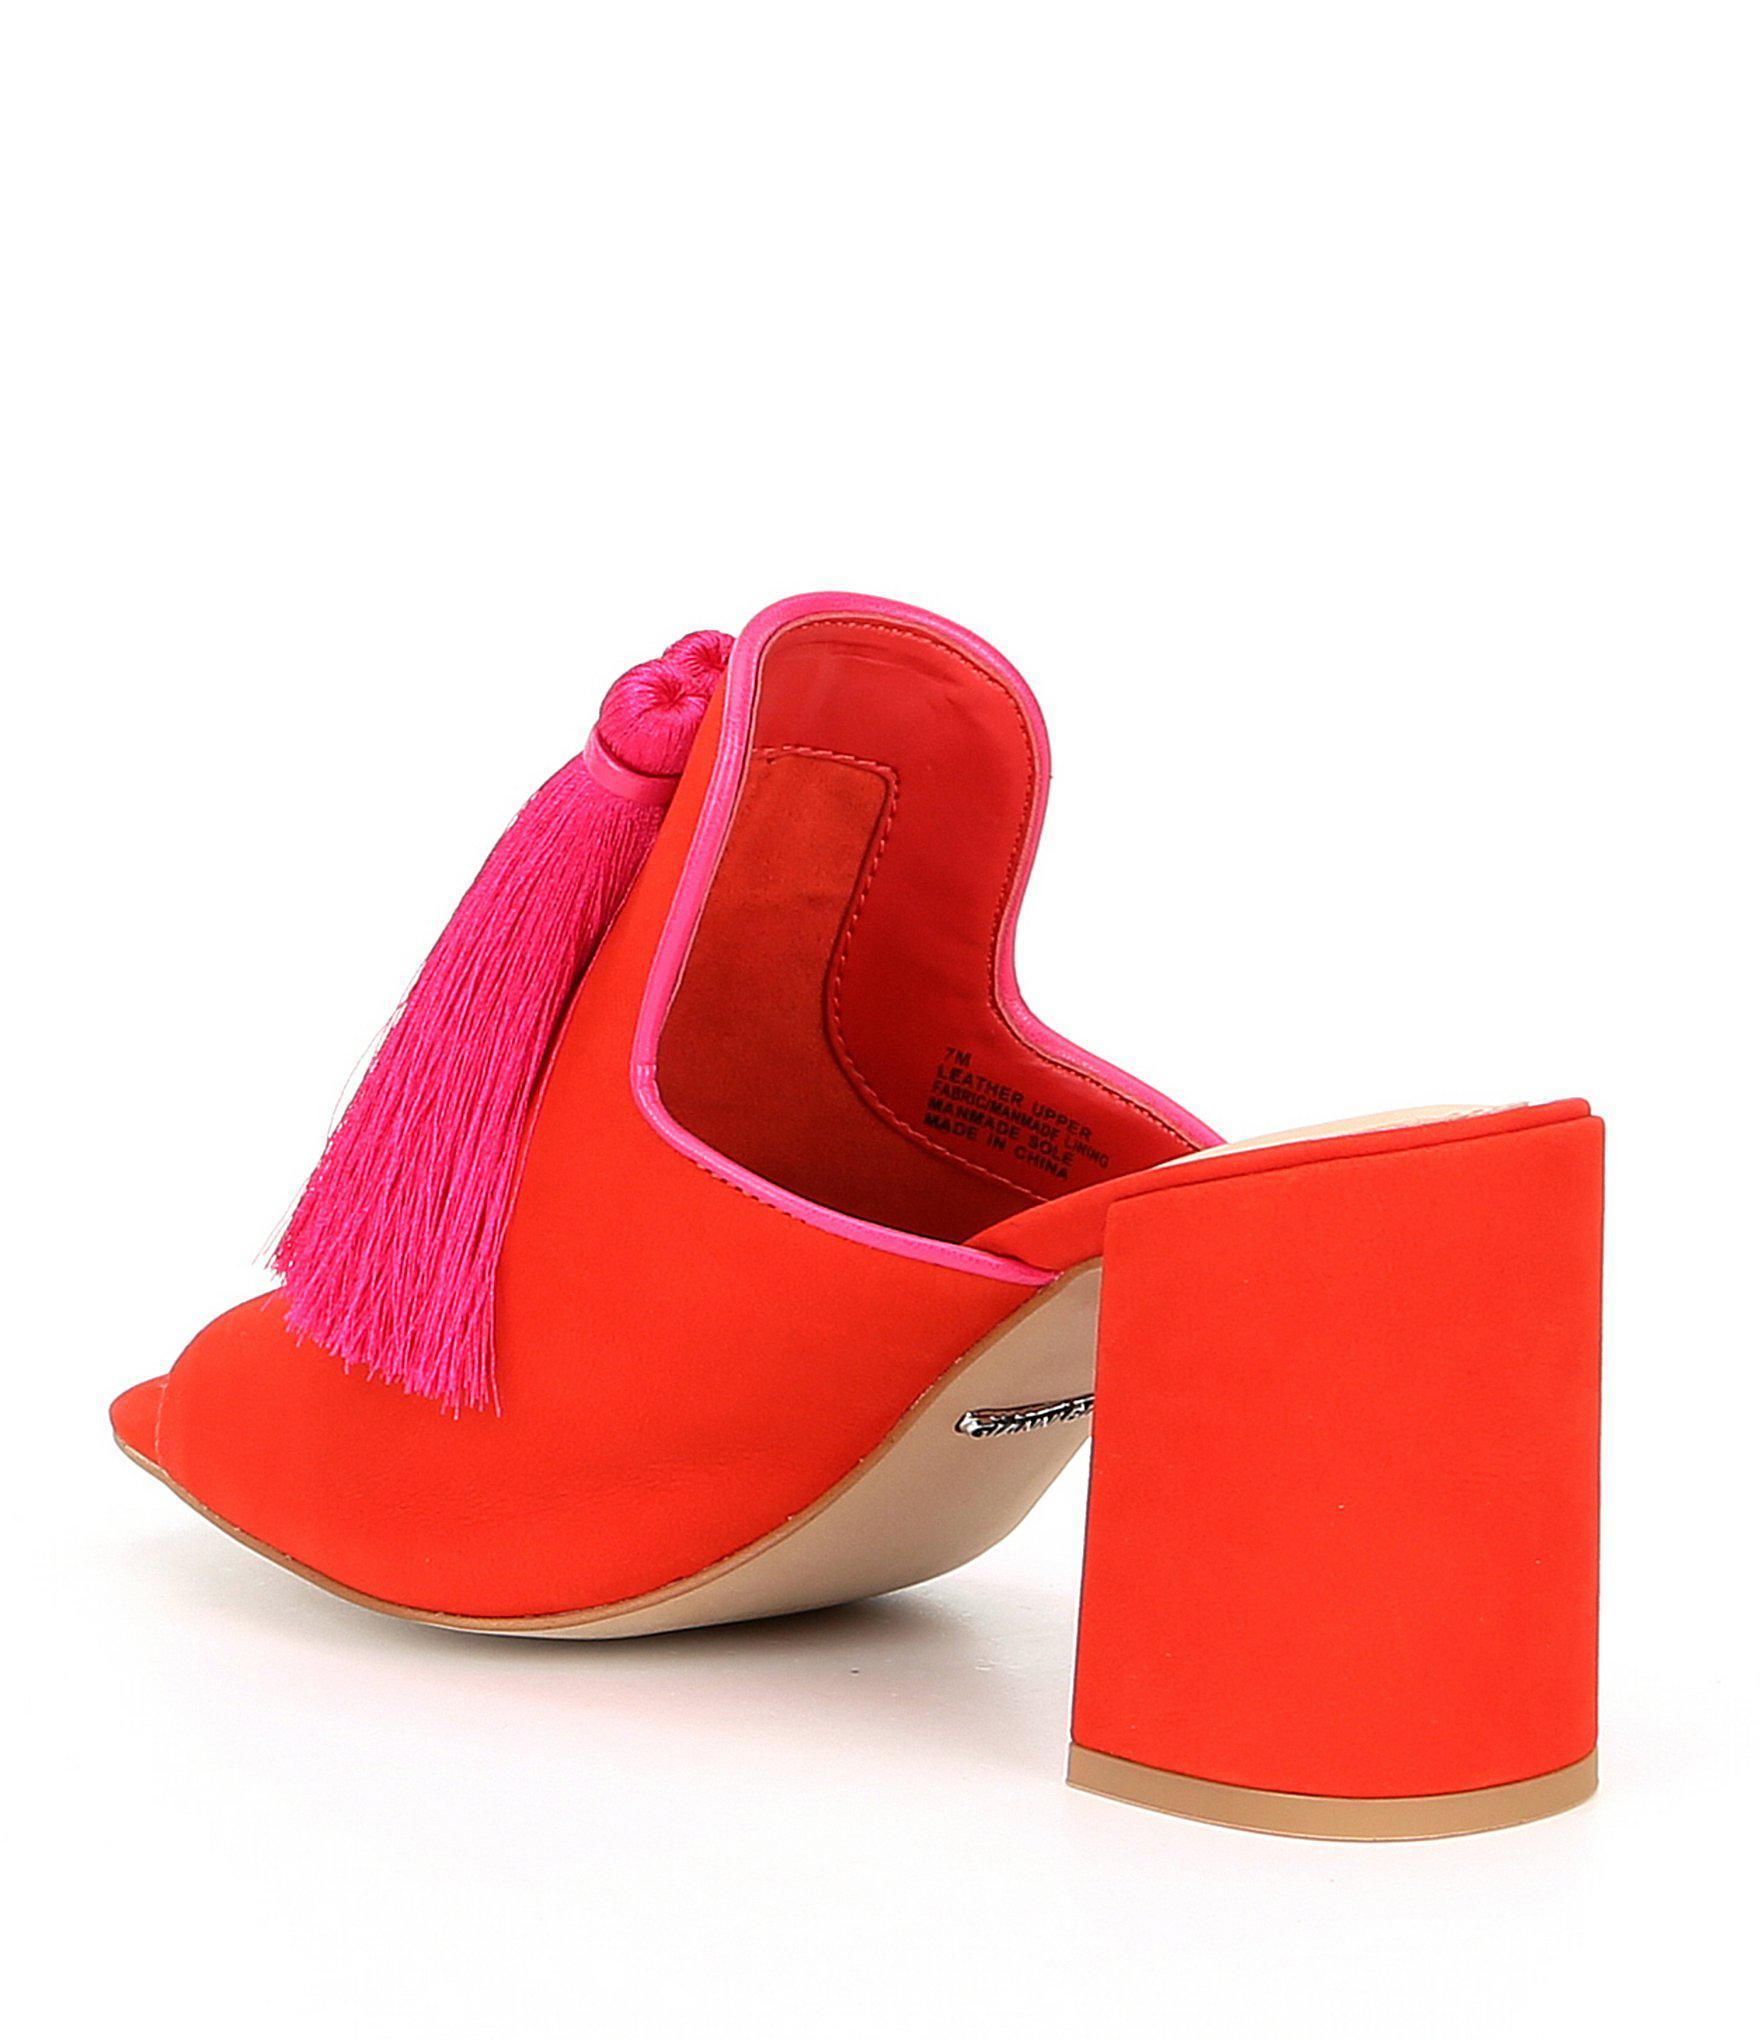 3725d7bd507 Gianni Bini - Red Moneekas Block Heel Tassel Mules - Lyst. View fullscreen